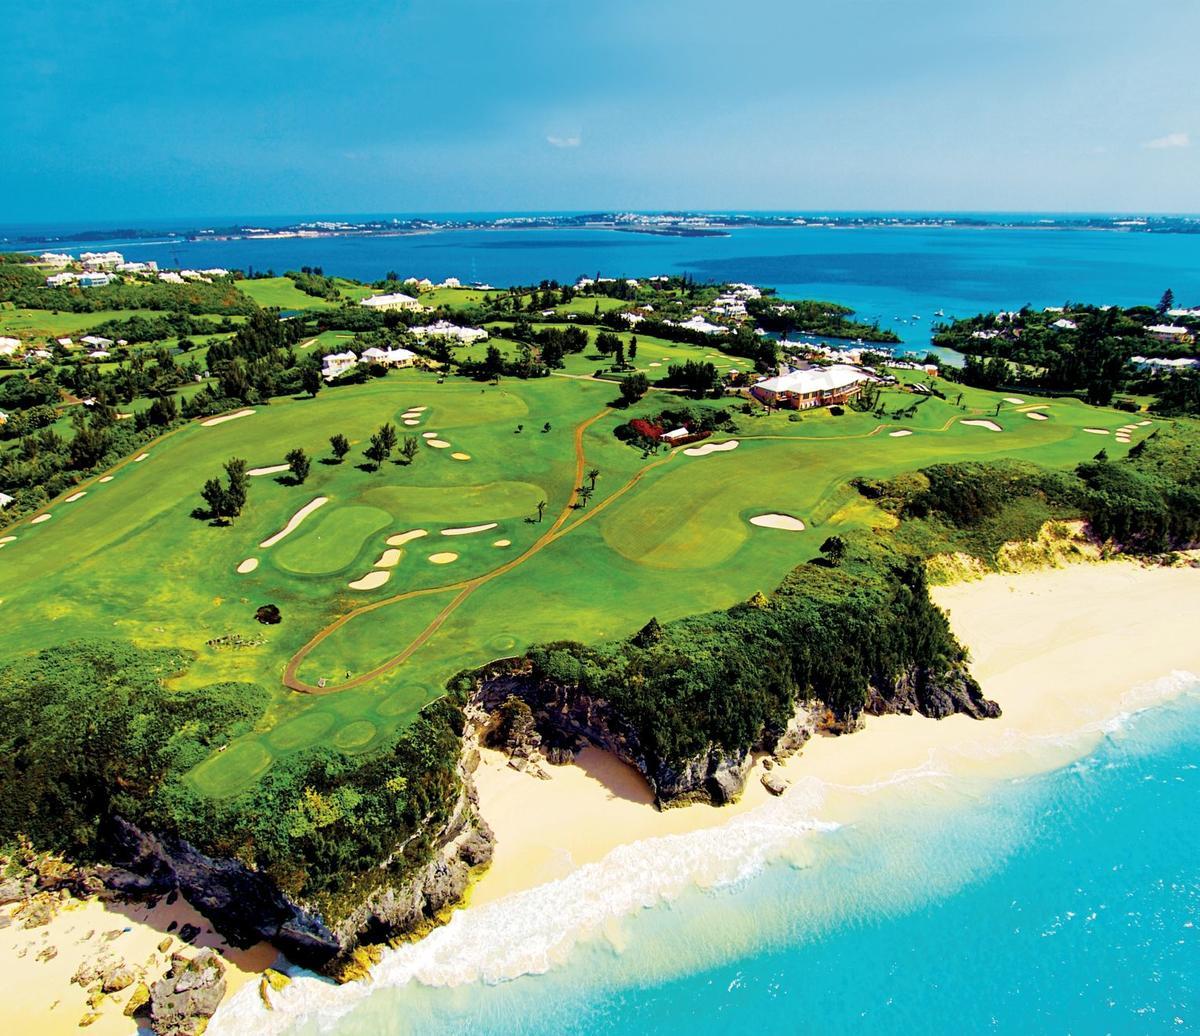 GV - Bermuda Golf - Mid Ocean golf course